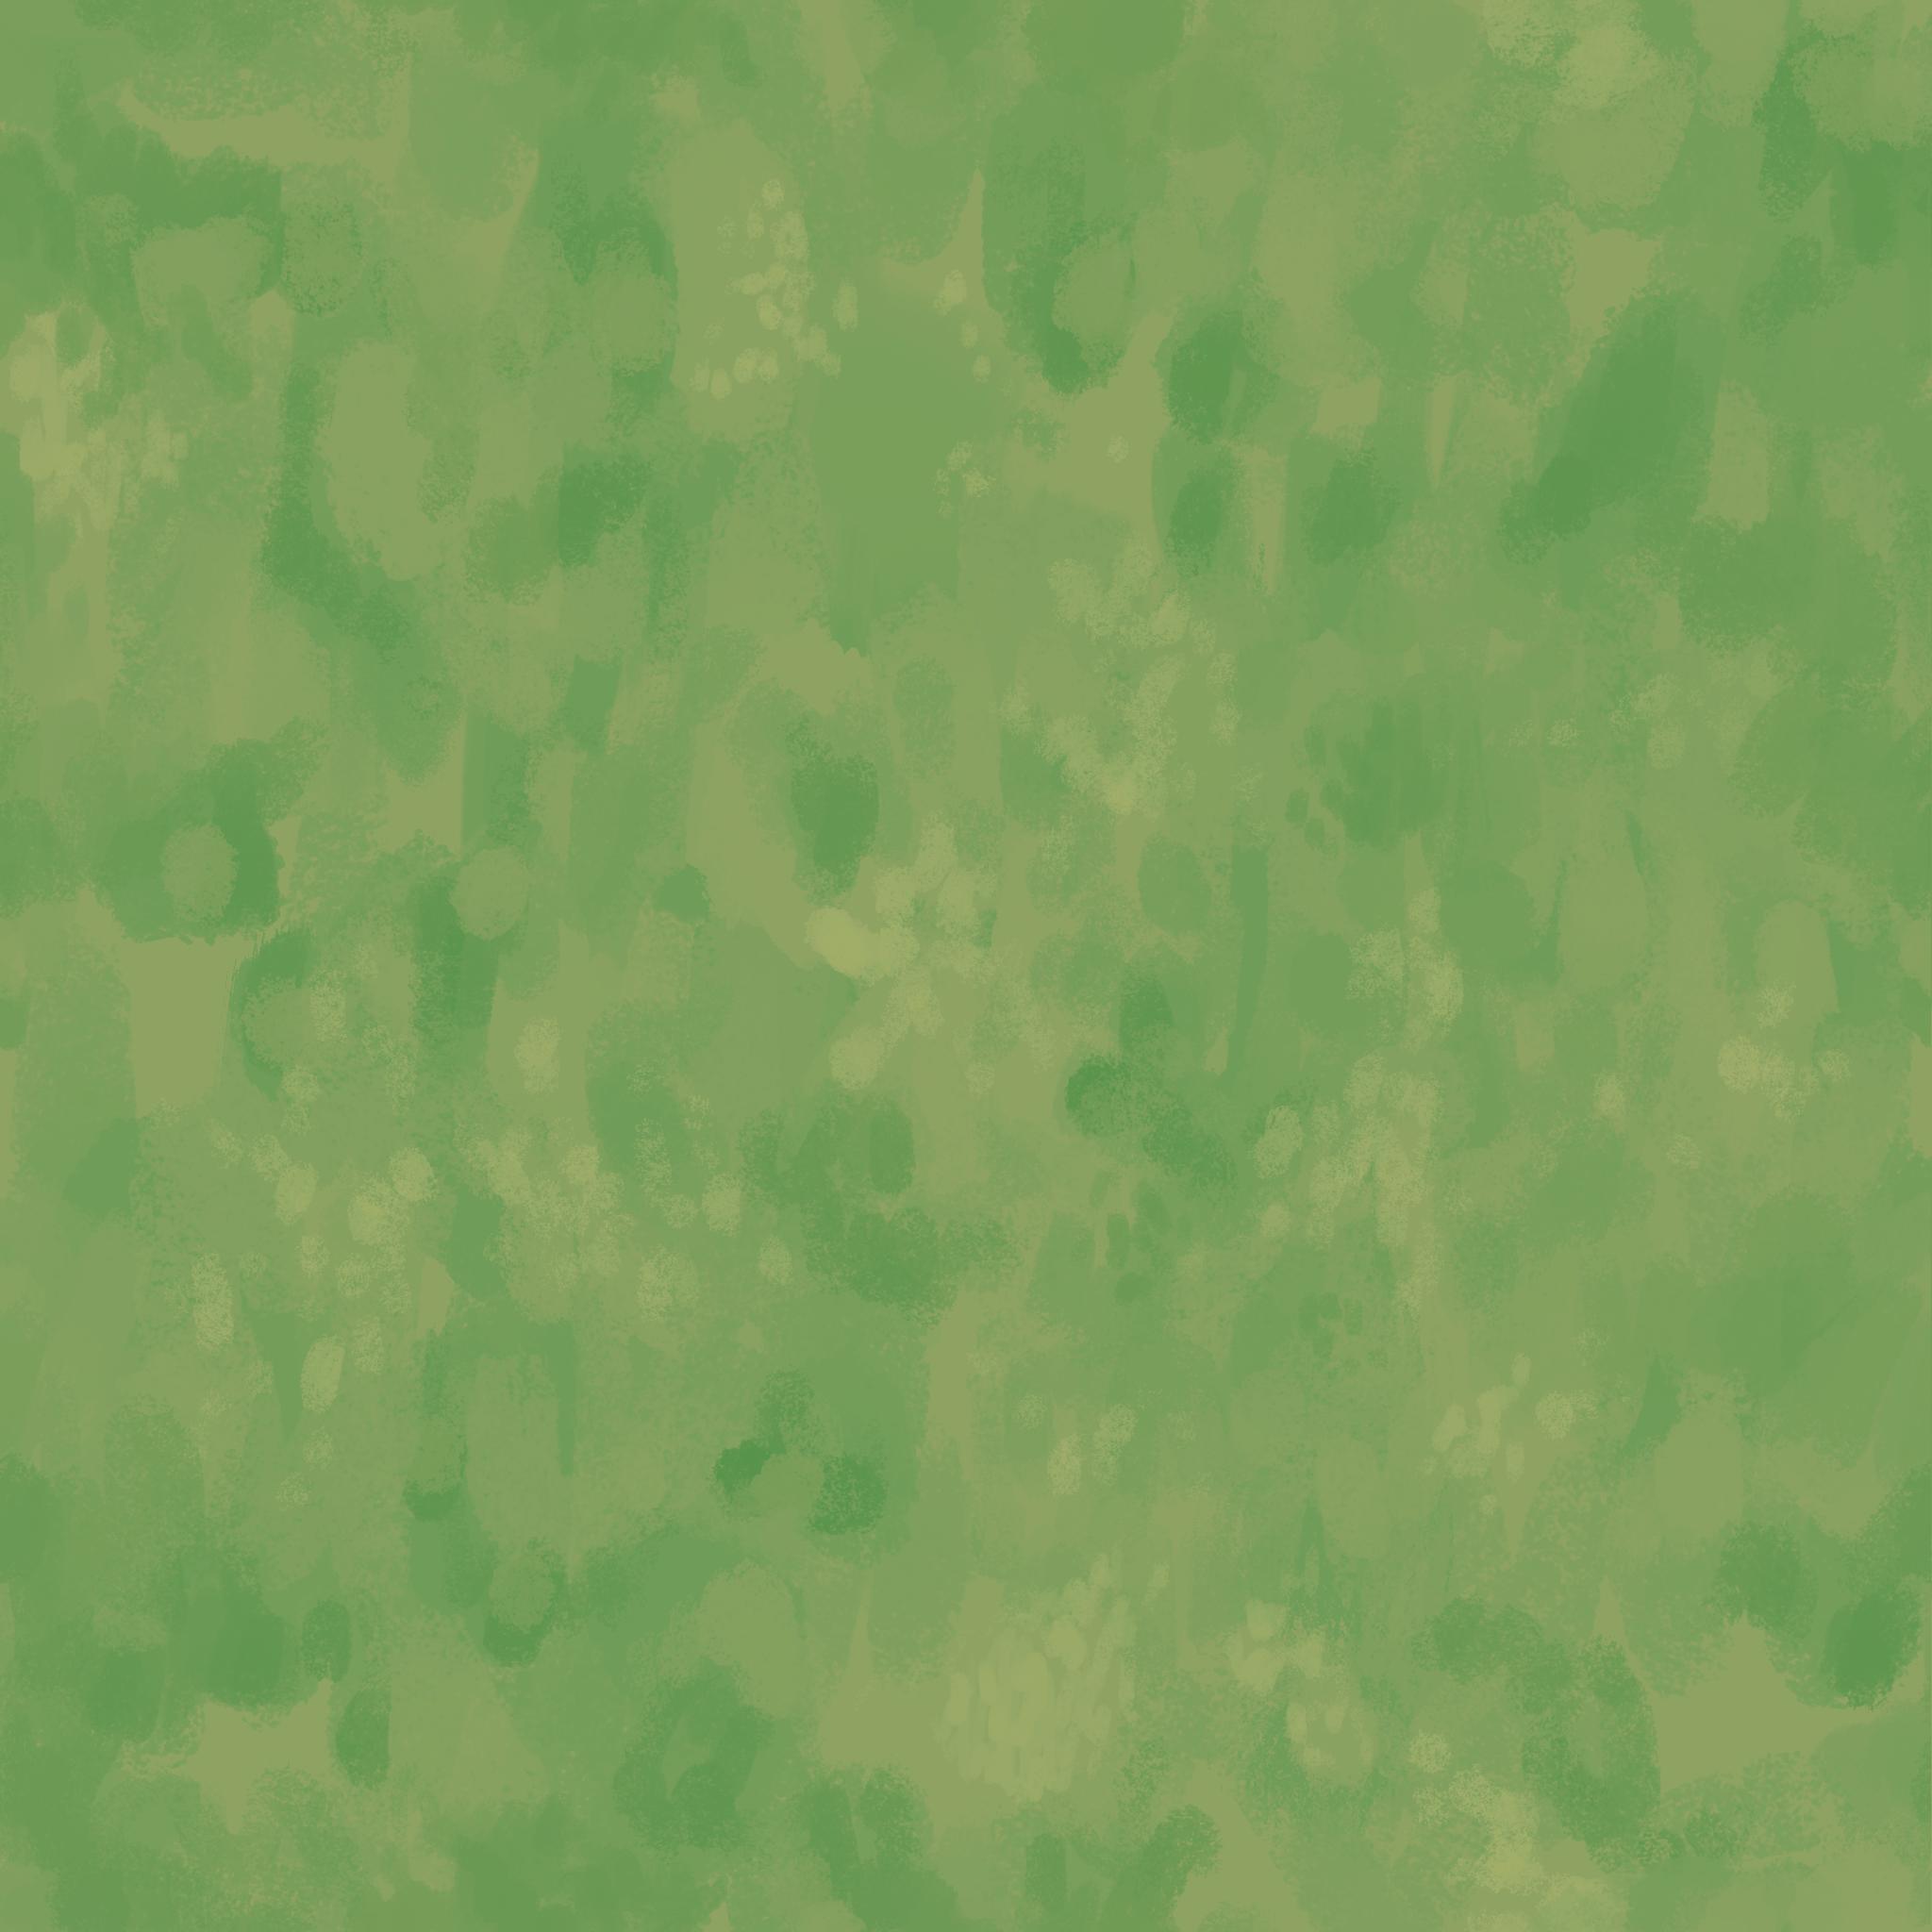 Grass_Golden_Variation.png